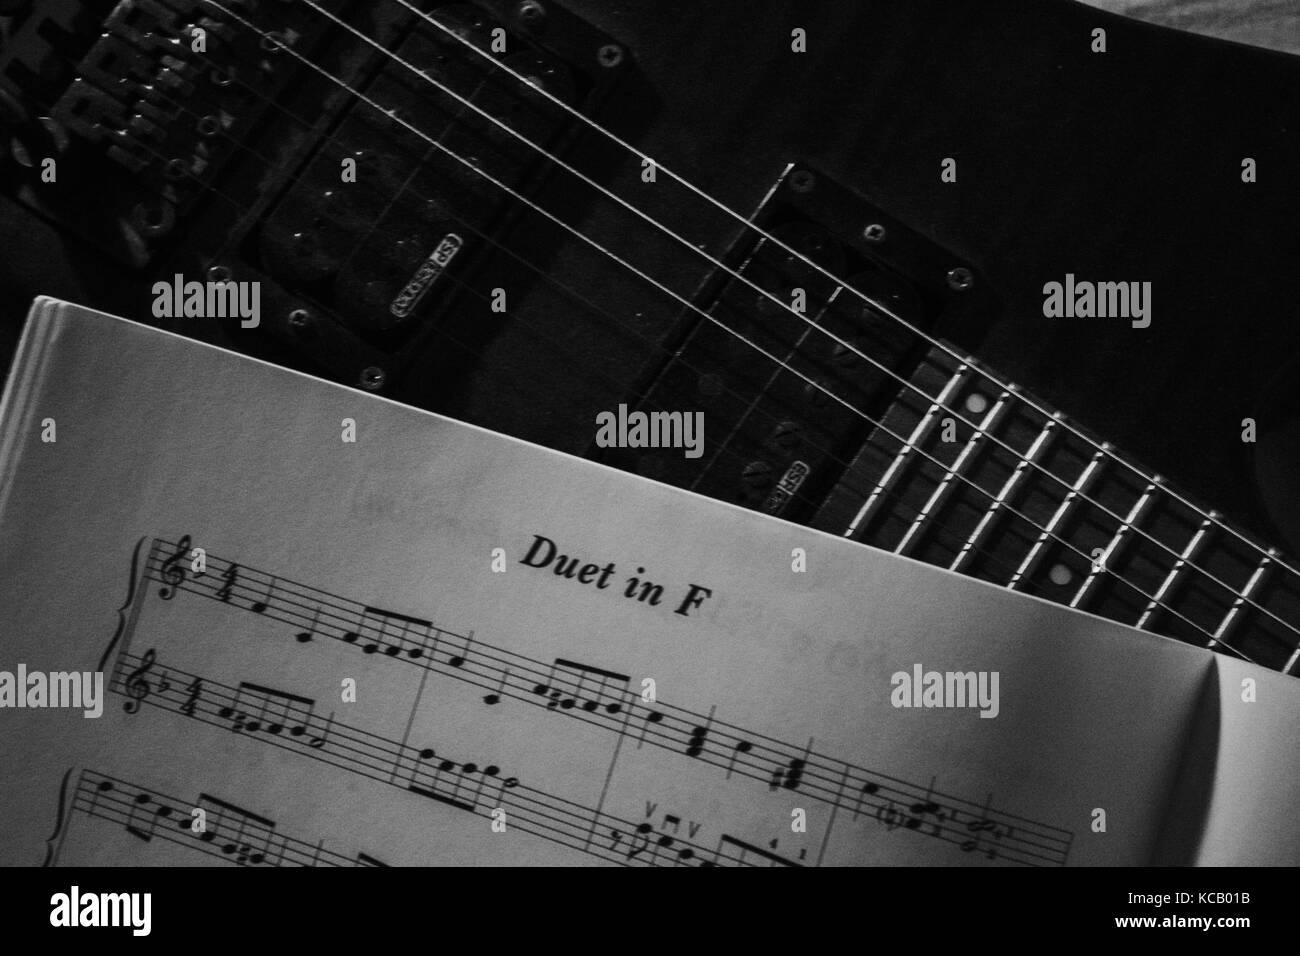 Retro Sheet Music Stock Photos & Retro Sheet Music Stock Images - Alamy